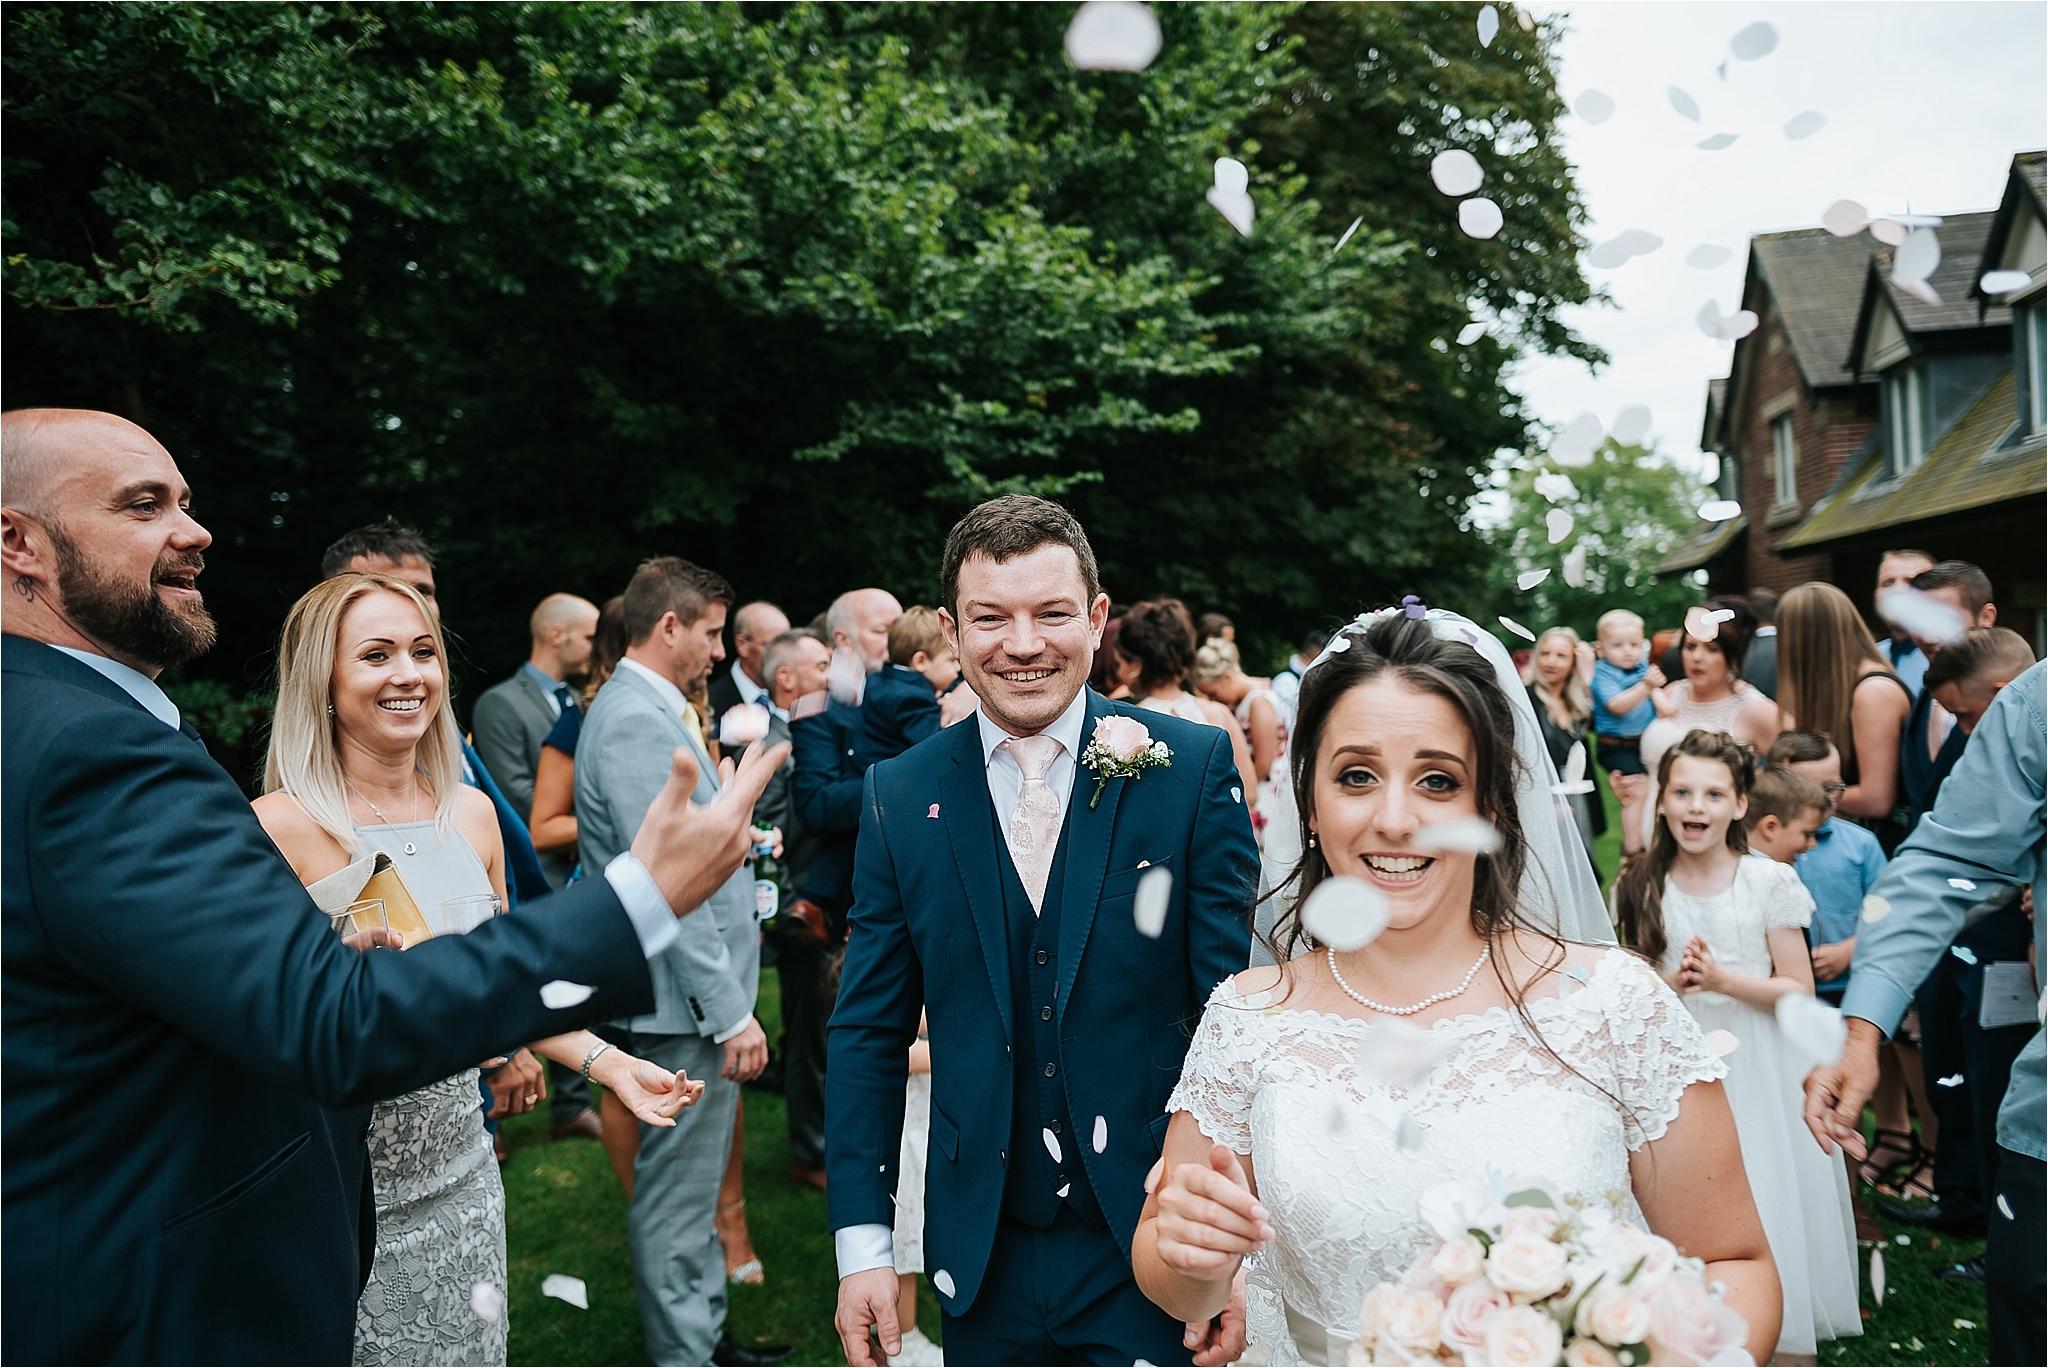 thevilla+lancashire+wreagreen+wedding+photographer101.jpg